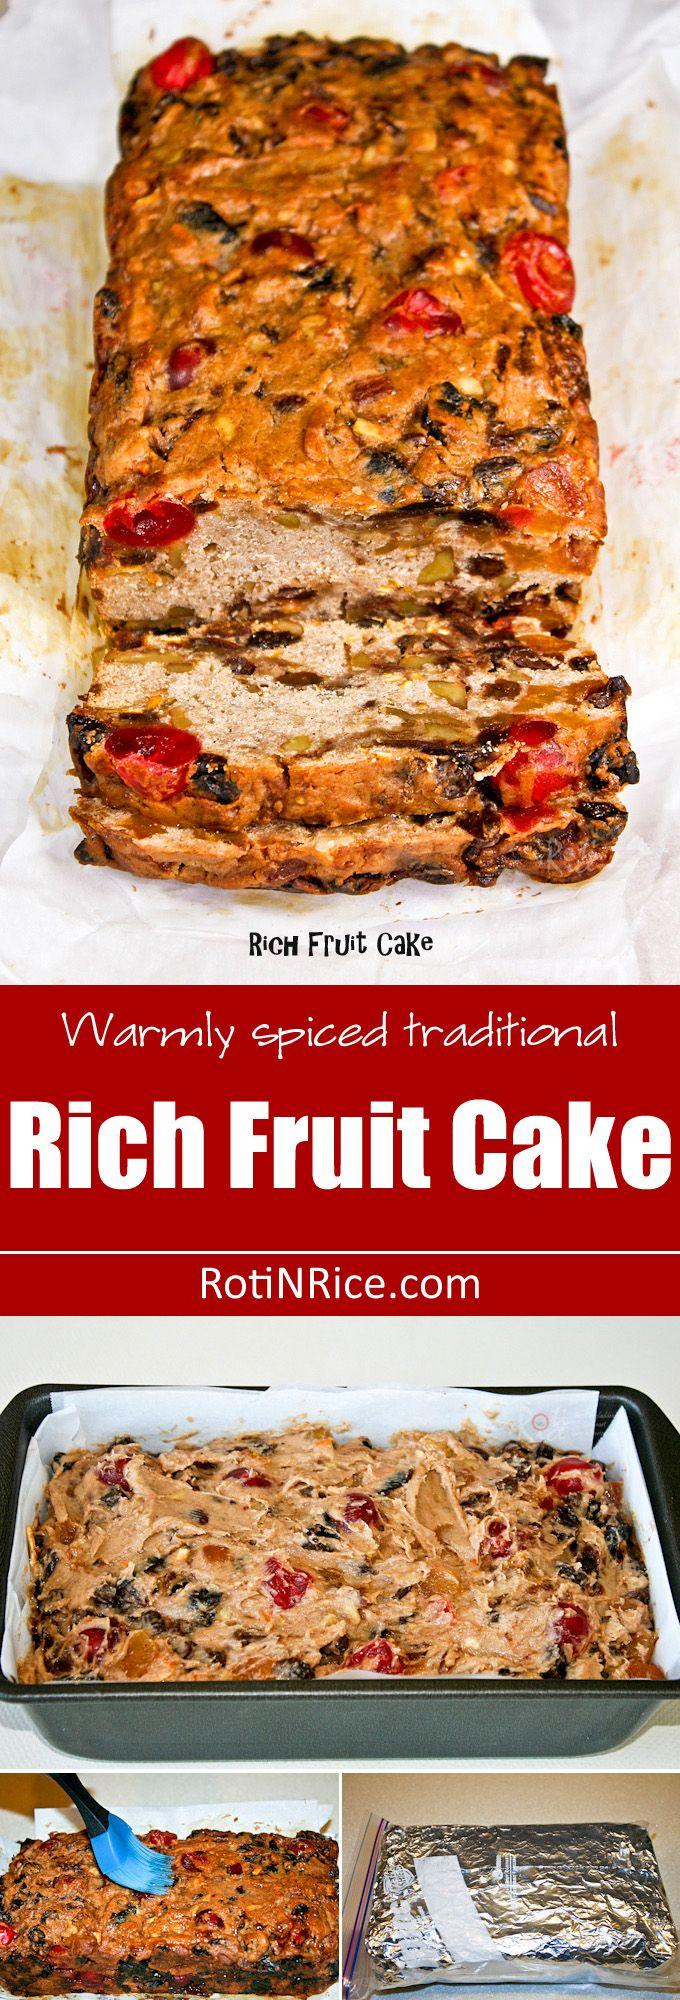 Rich Fruit Cake Recipe Recipes Fruit Cake Fruitcake Recipes